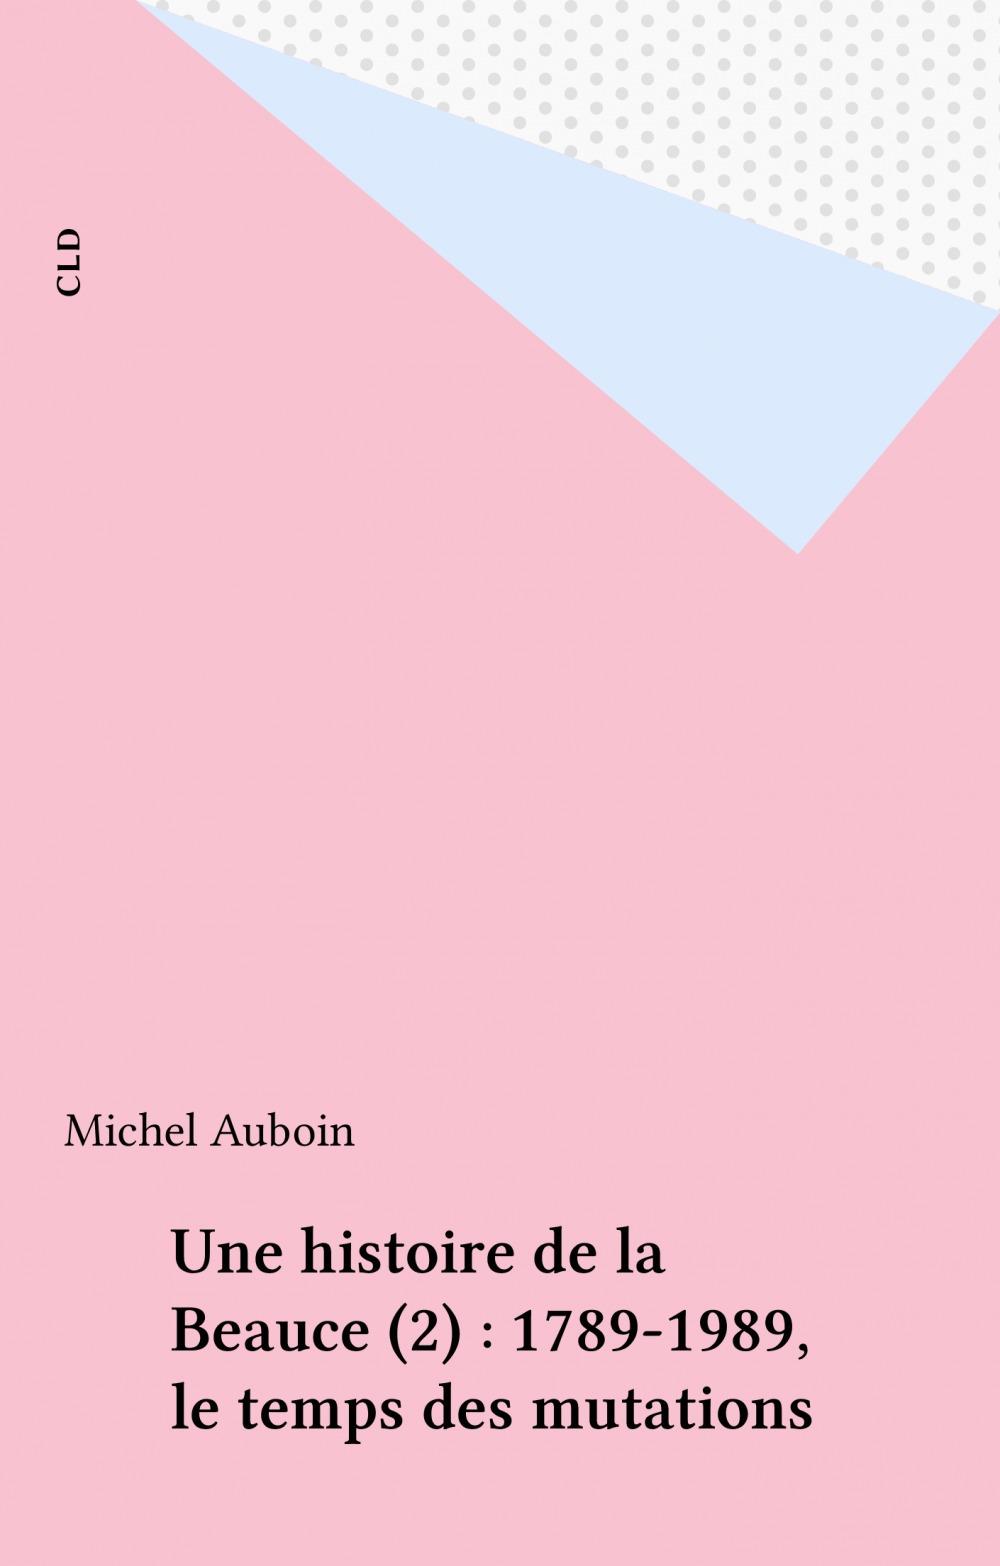 Histoire de la beauce (tome 2)